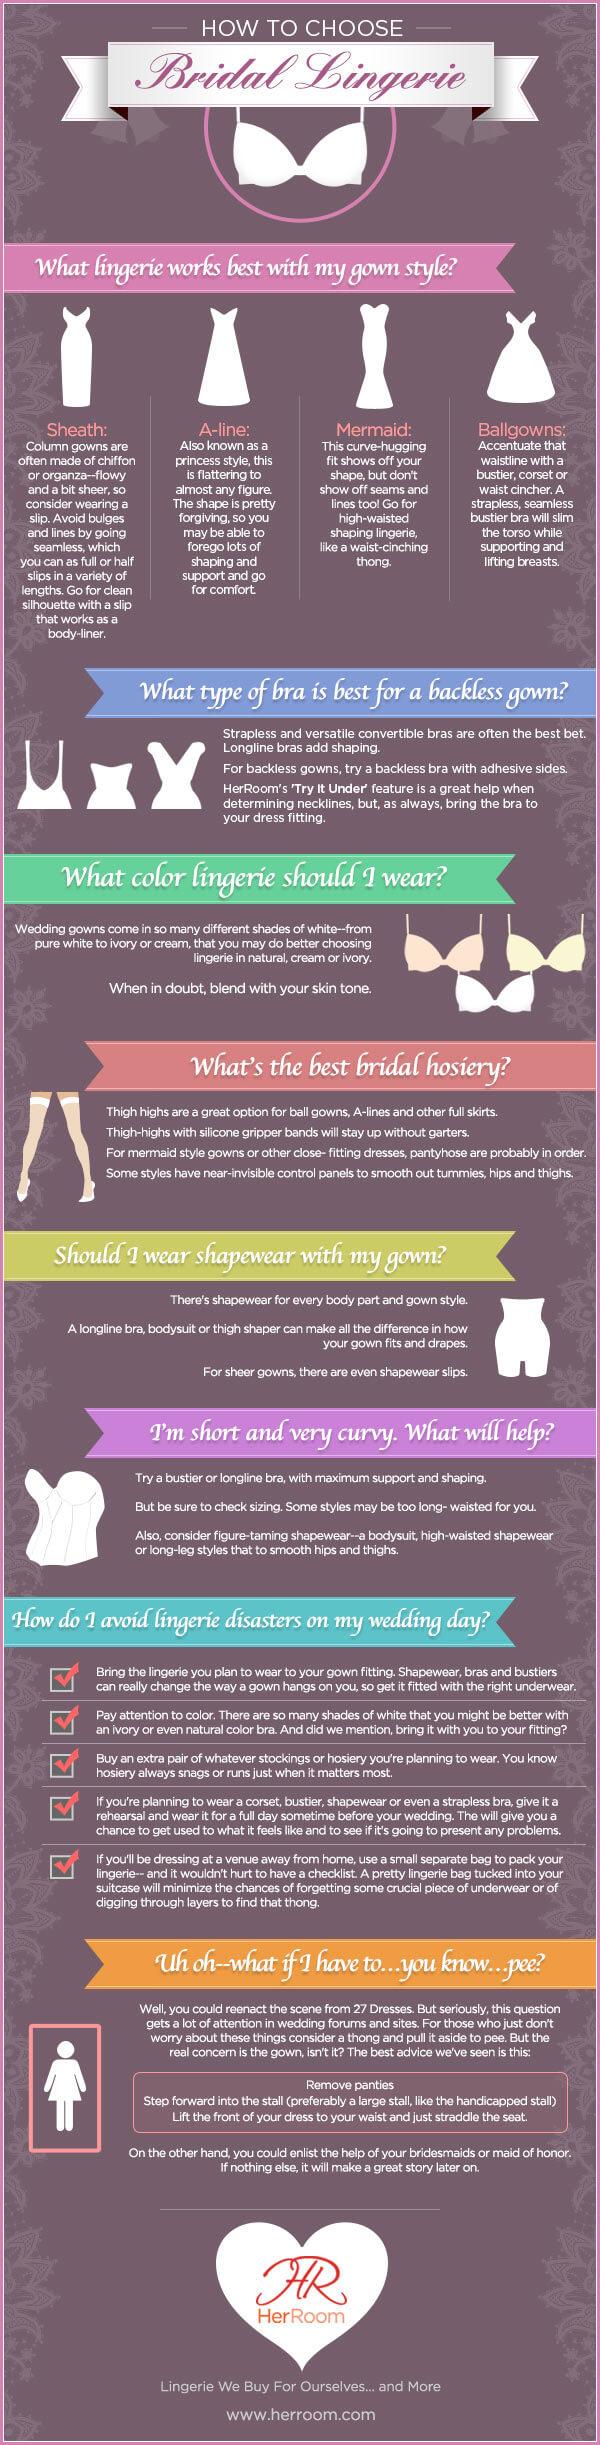 Bridal Lingerie Infographic